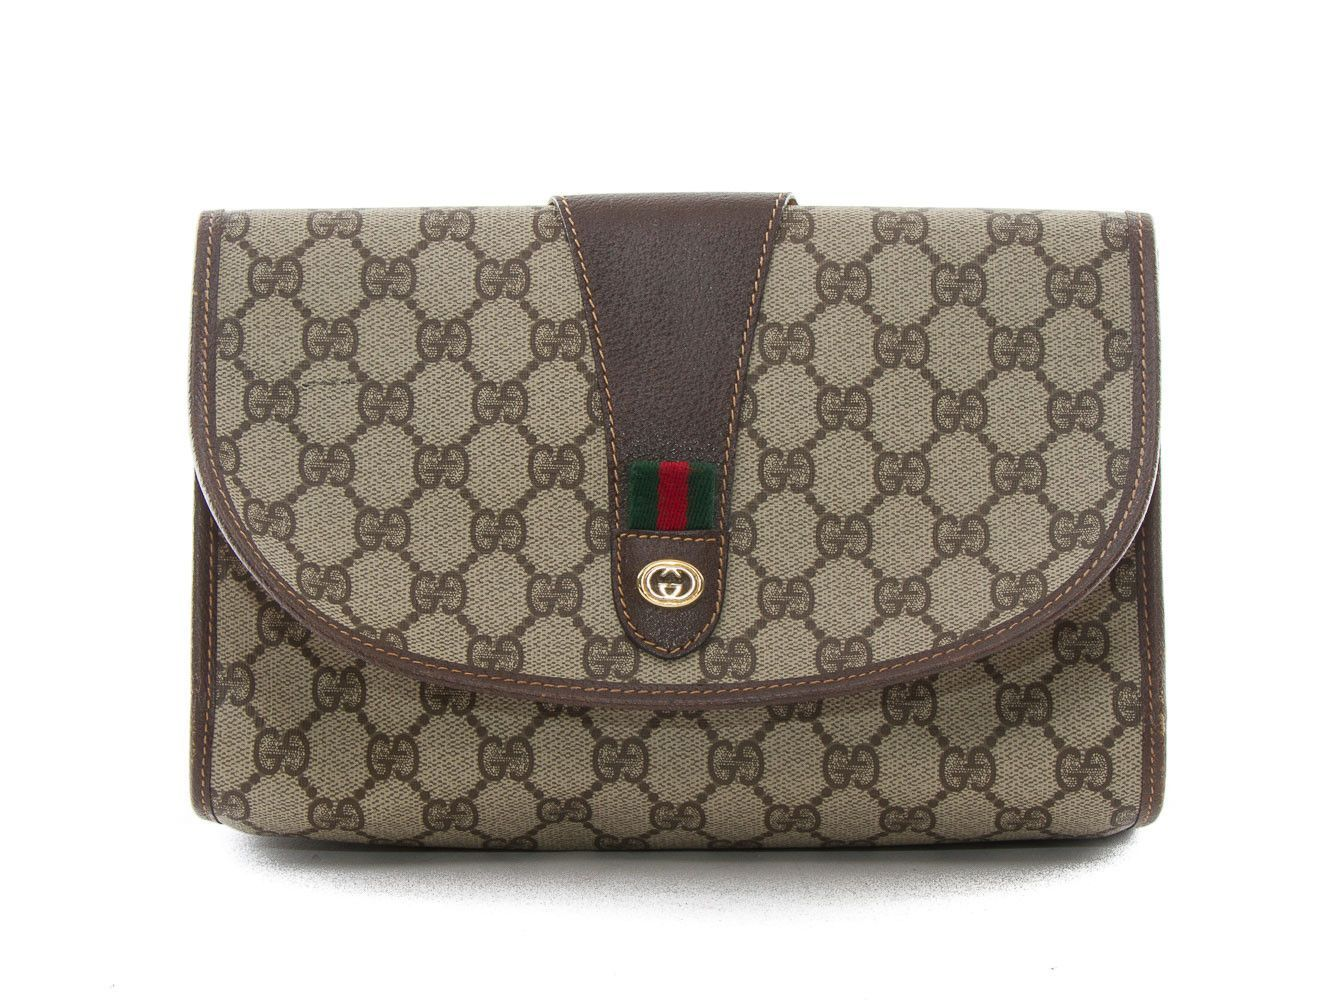 807e1c83ed1f33 Authentic Gucci Accessory Collection vintage cosmetics bag | Vintage ...